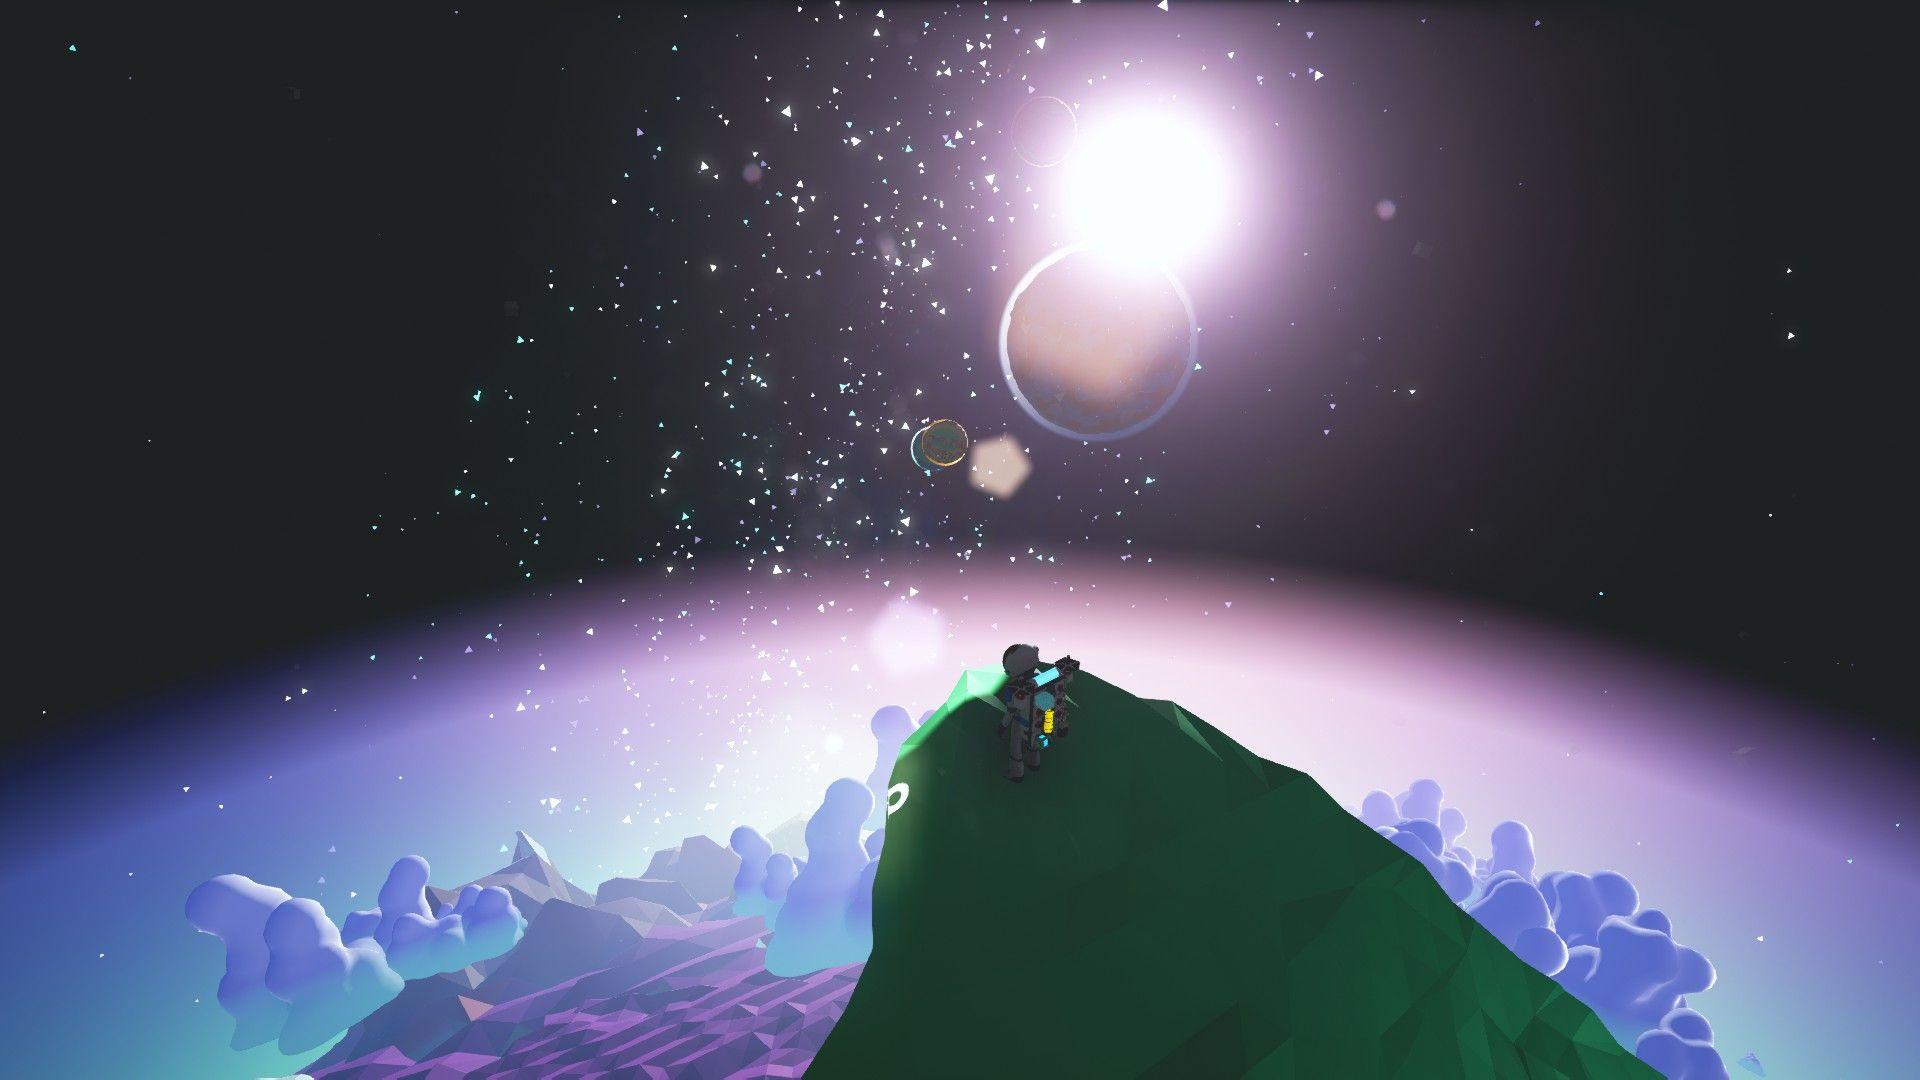 Astroneer Astroneerwallpaper Astroneergame Astroneerconceptart Astroneerbase Astroneervideogame Gamer Life Game Design Cool Names